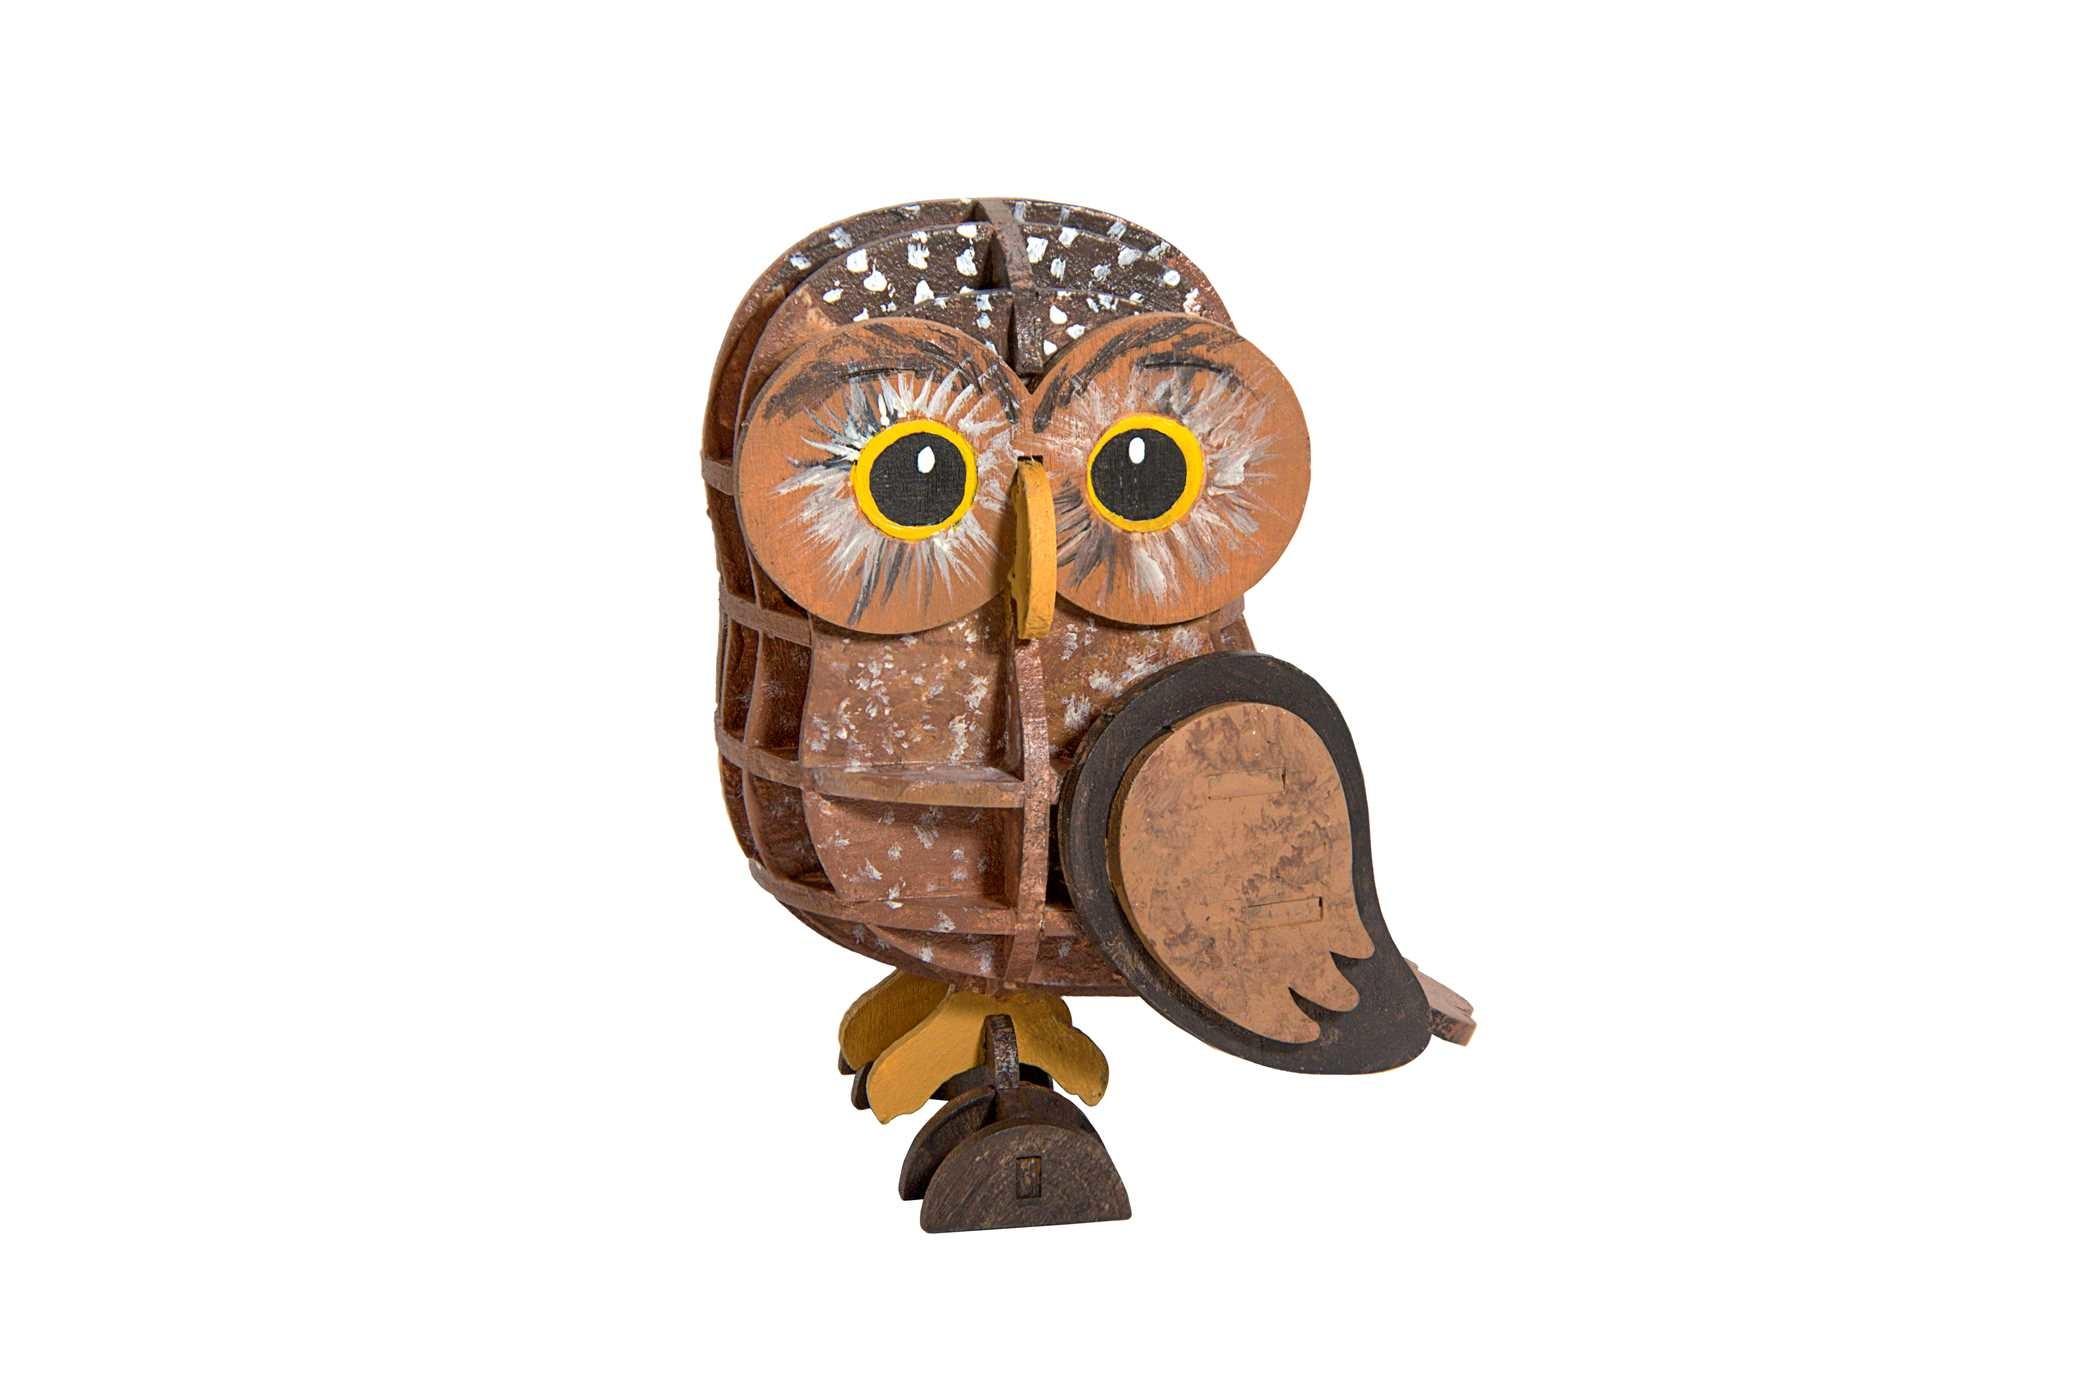 Incredibuilds owl 3d wood model 9781682980408.in01